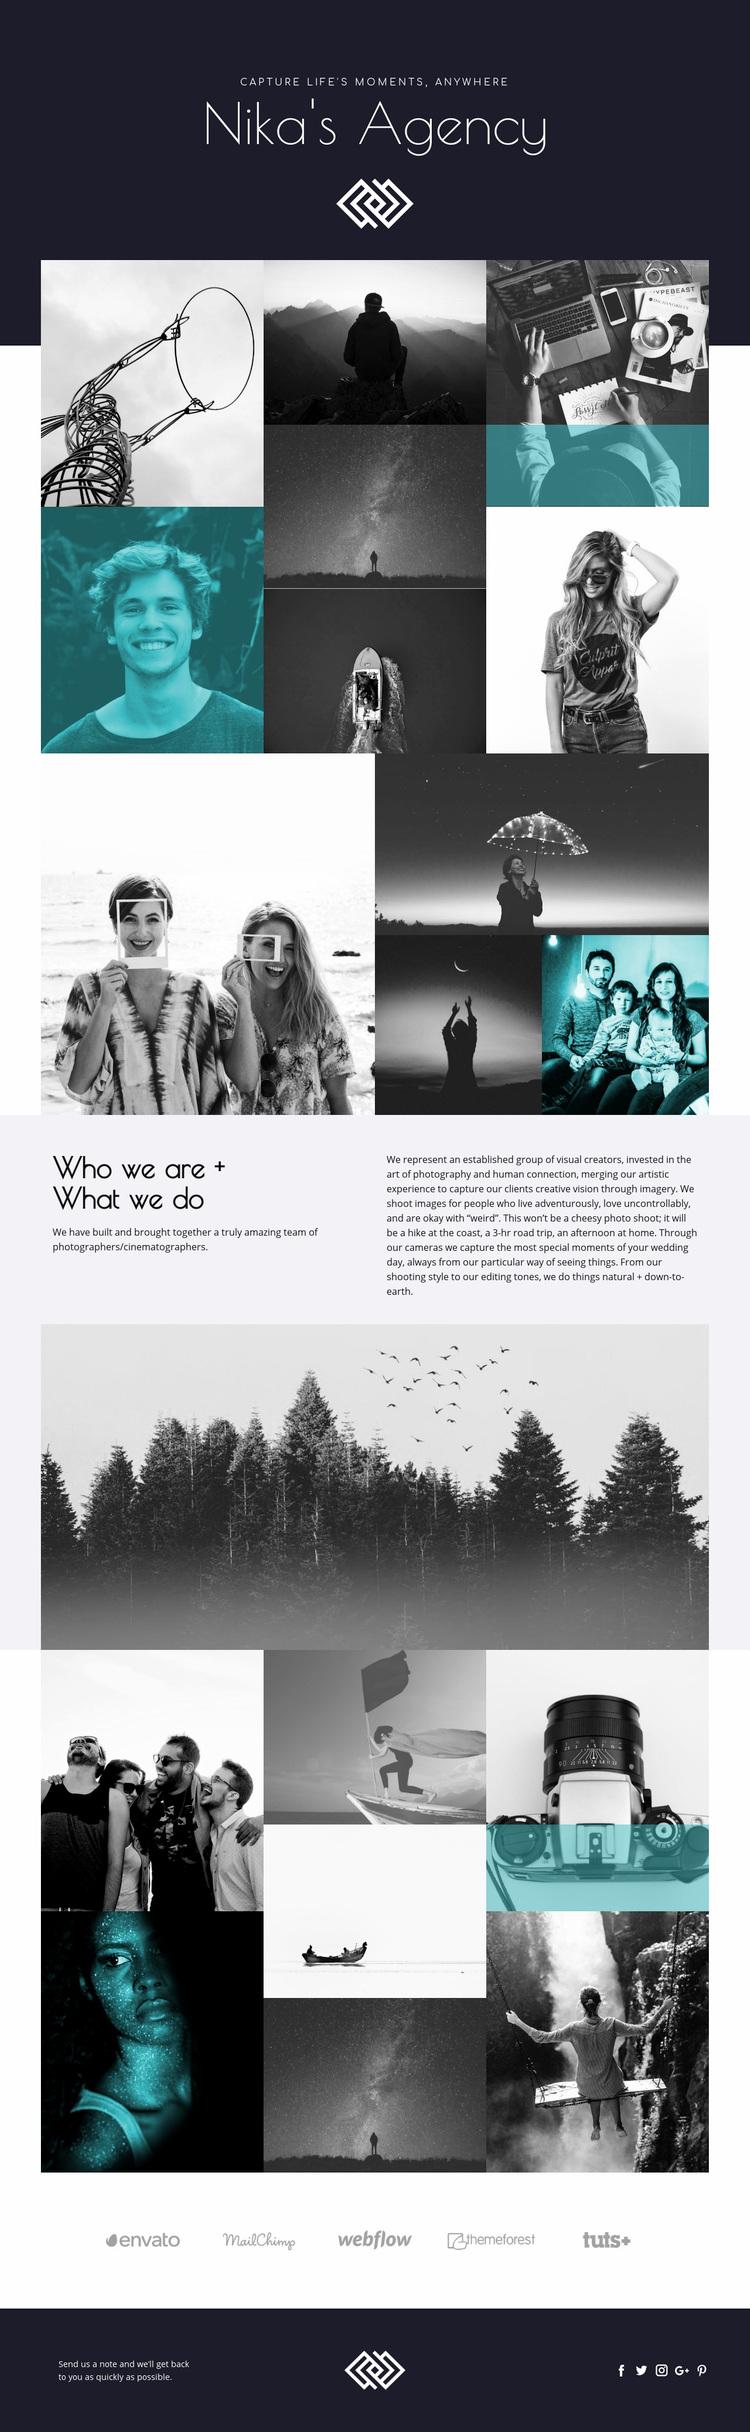 Nika's Agency Web Page Designer